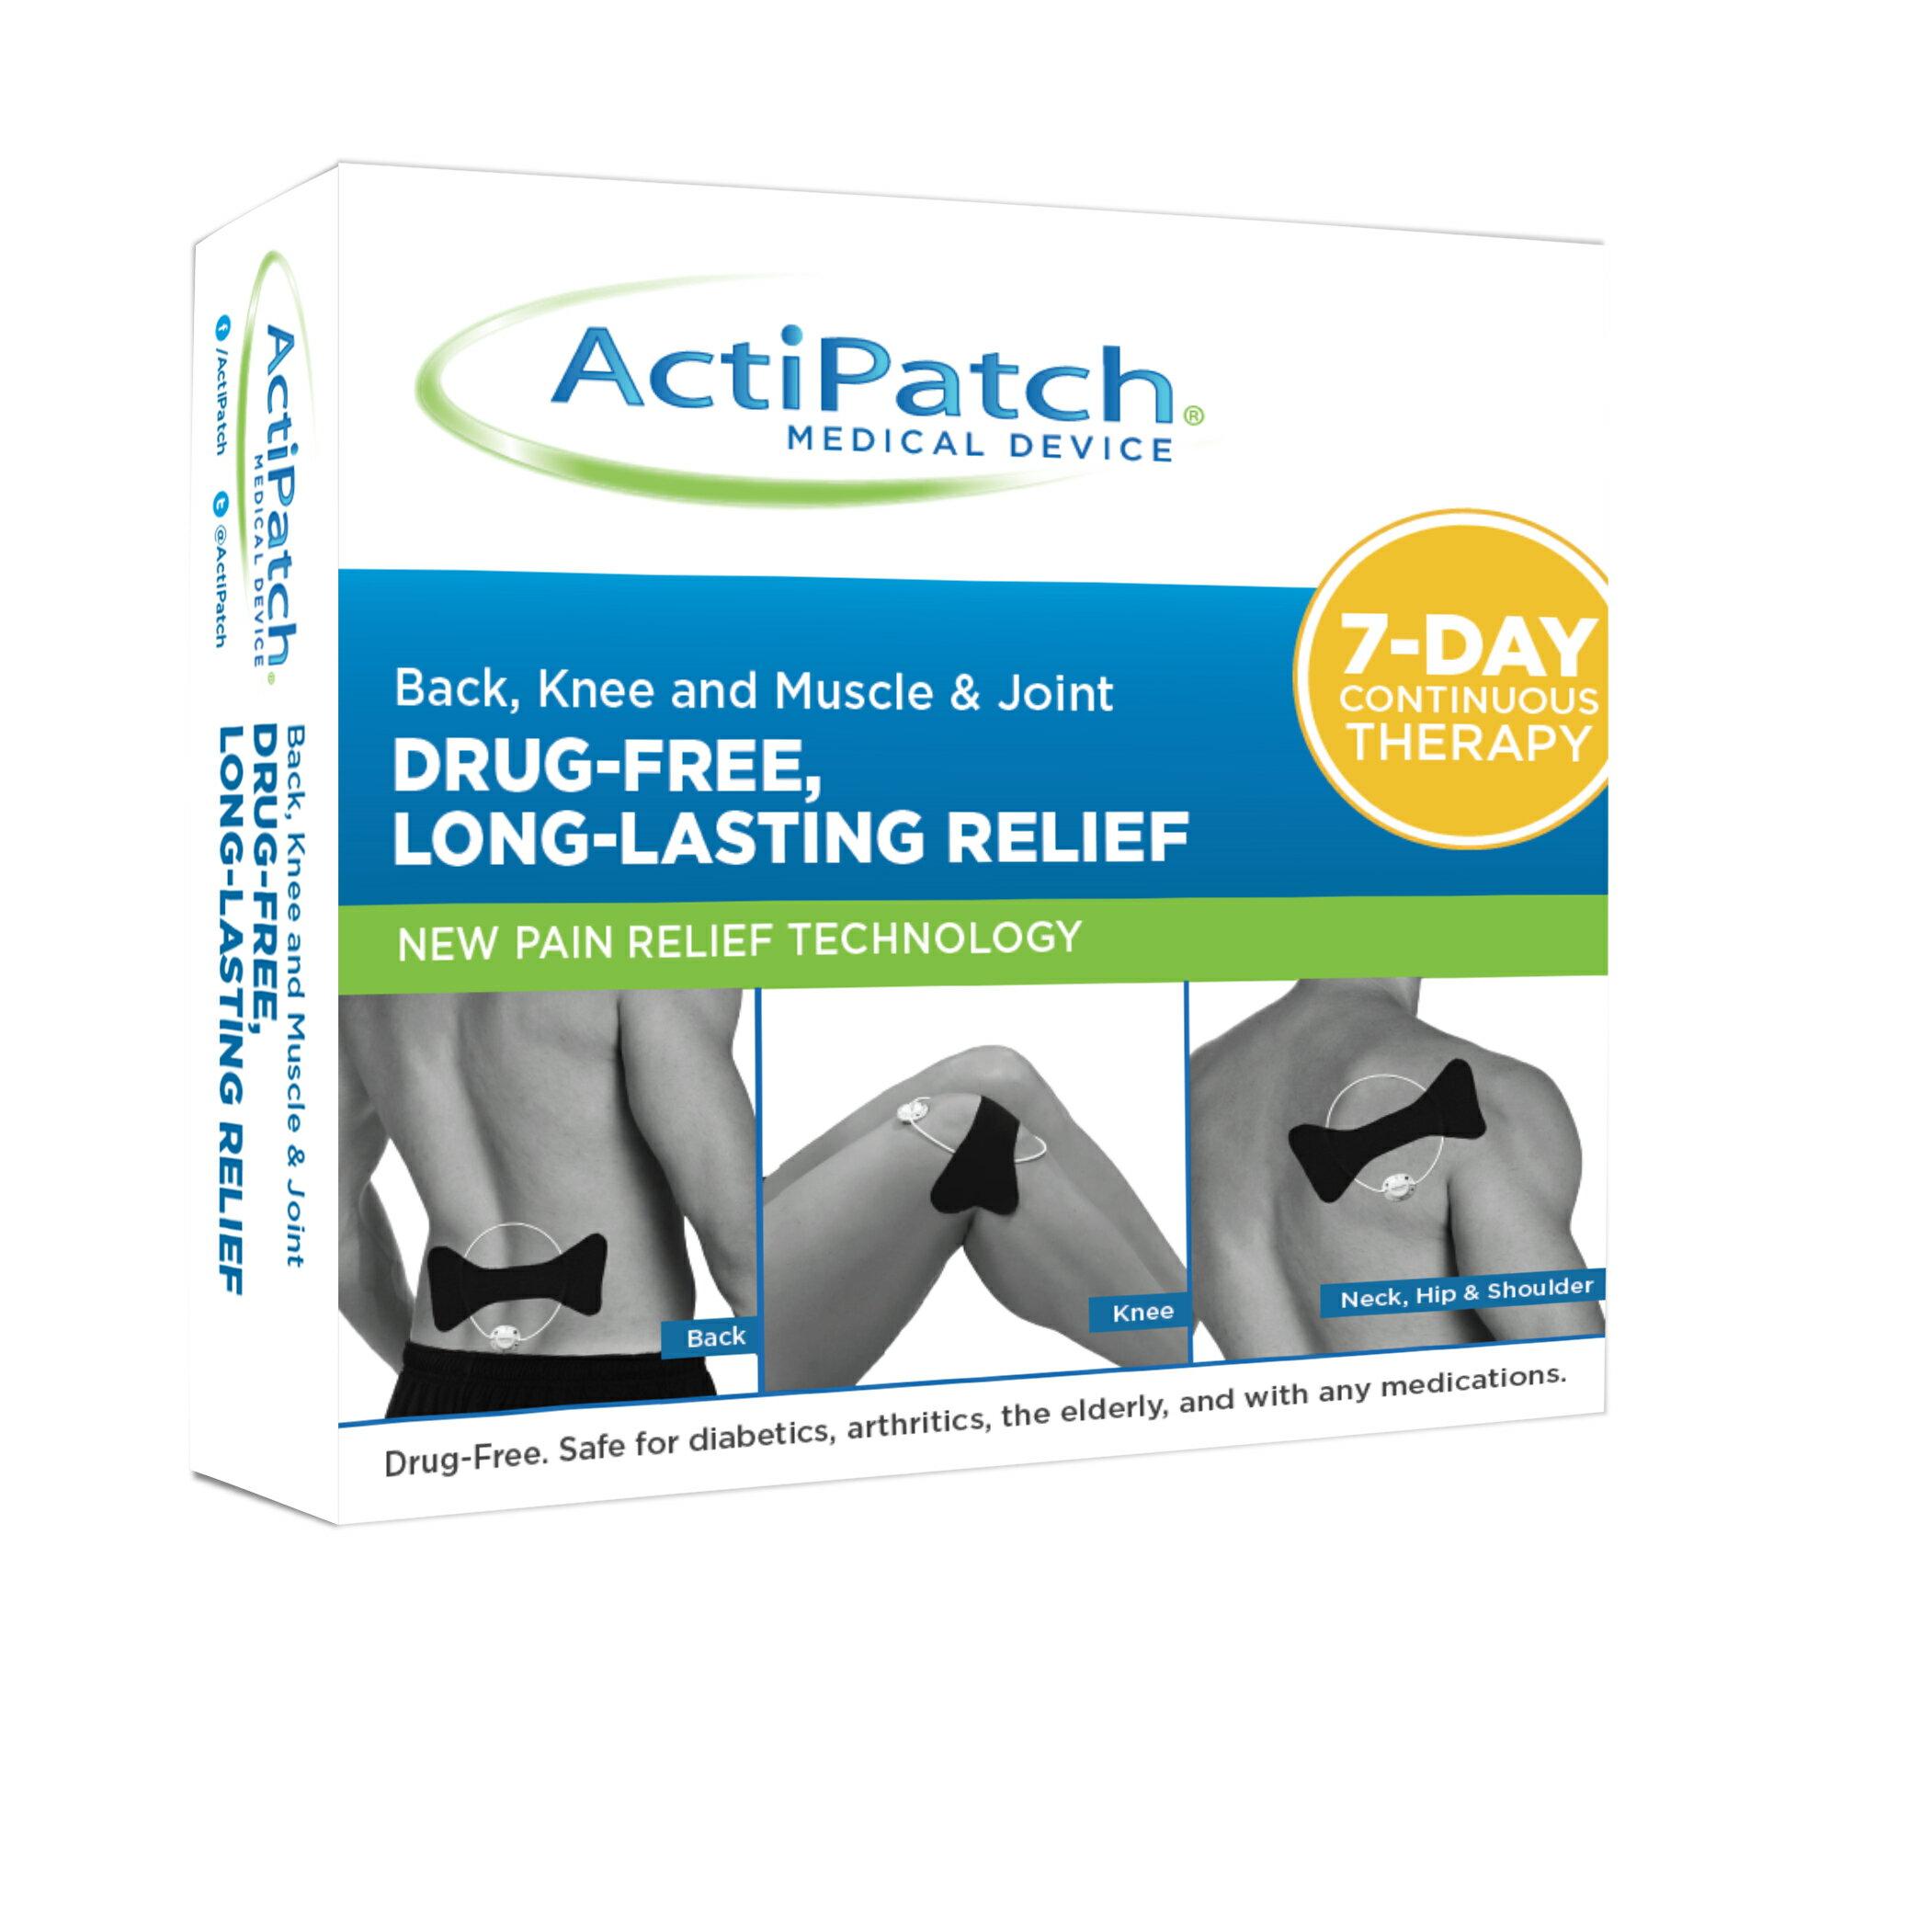 Actipatch 安疼舒痛環-7Day(168小時)